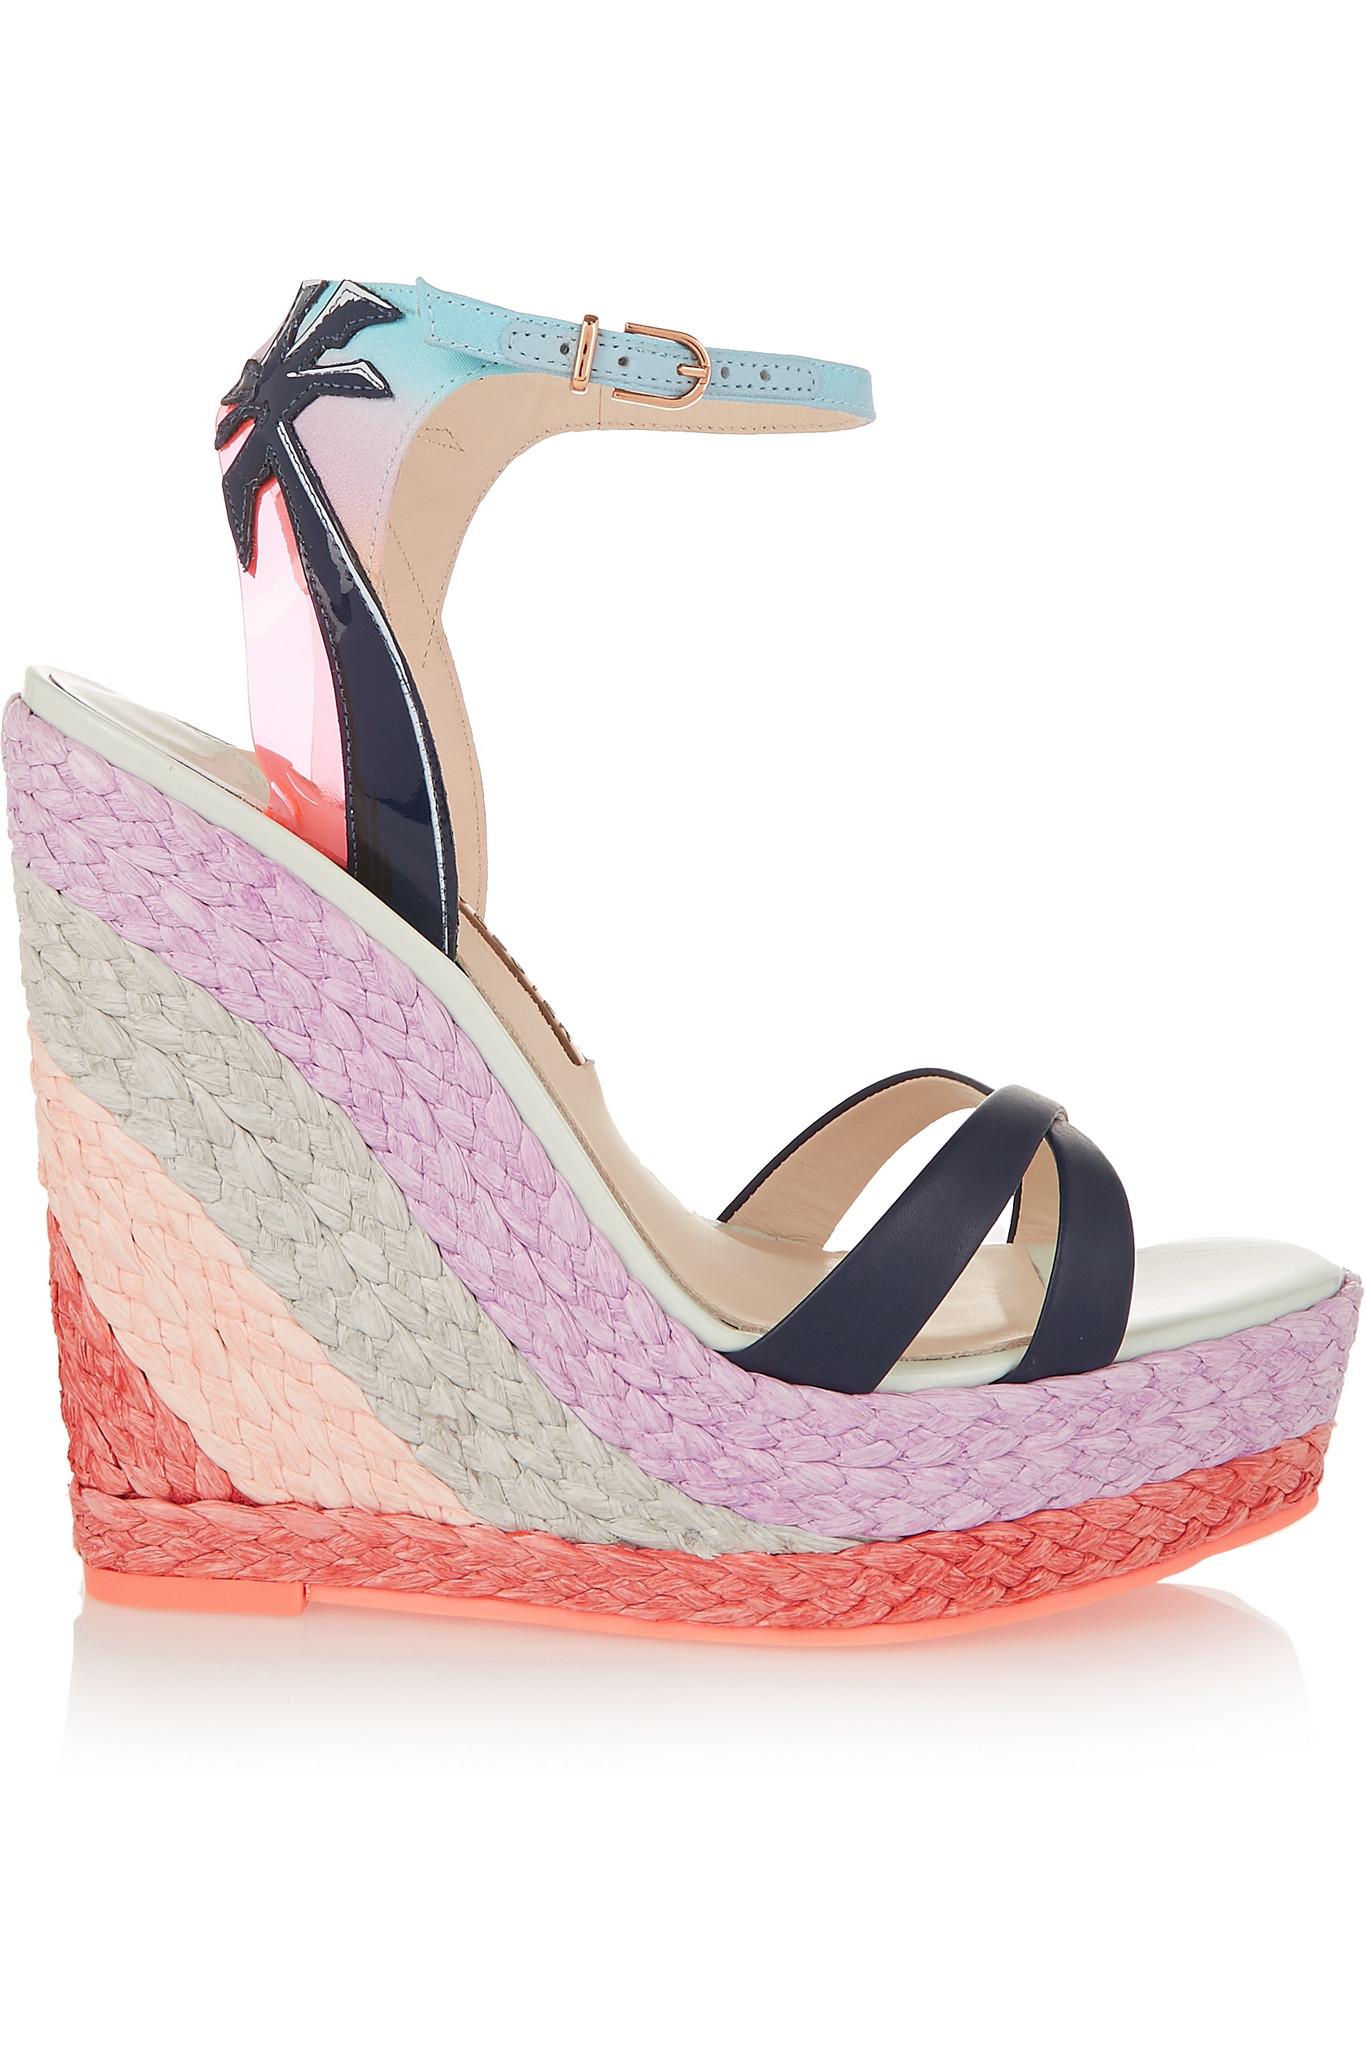 c1cd2216aad Lyst - Sophia Webster Lucita Malibu Leather Wedge Sandals in Pink